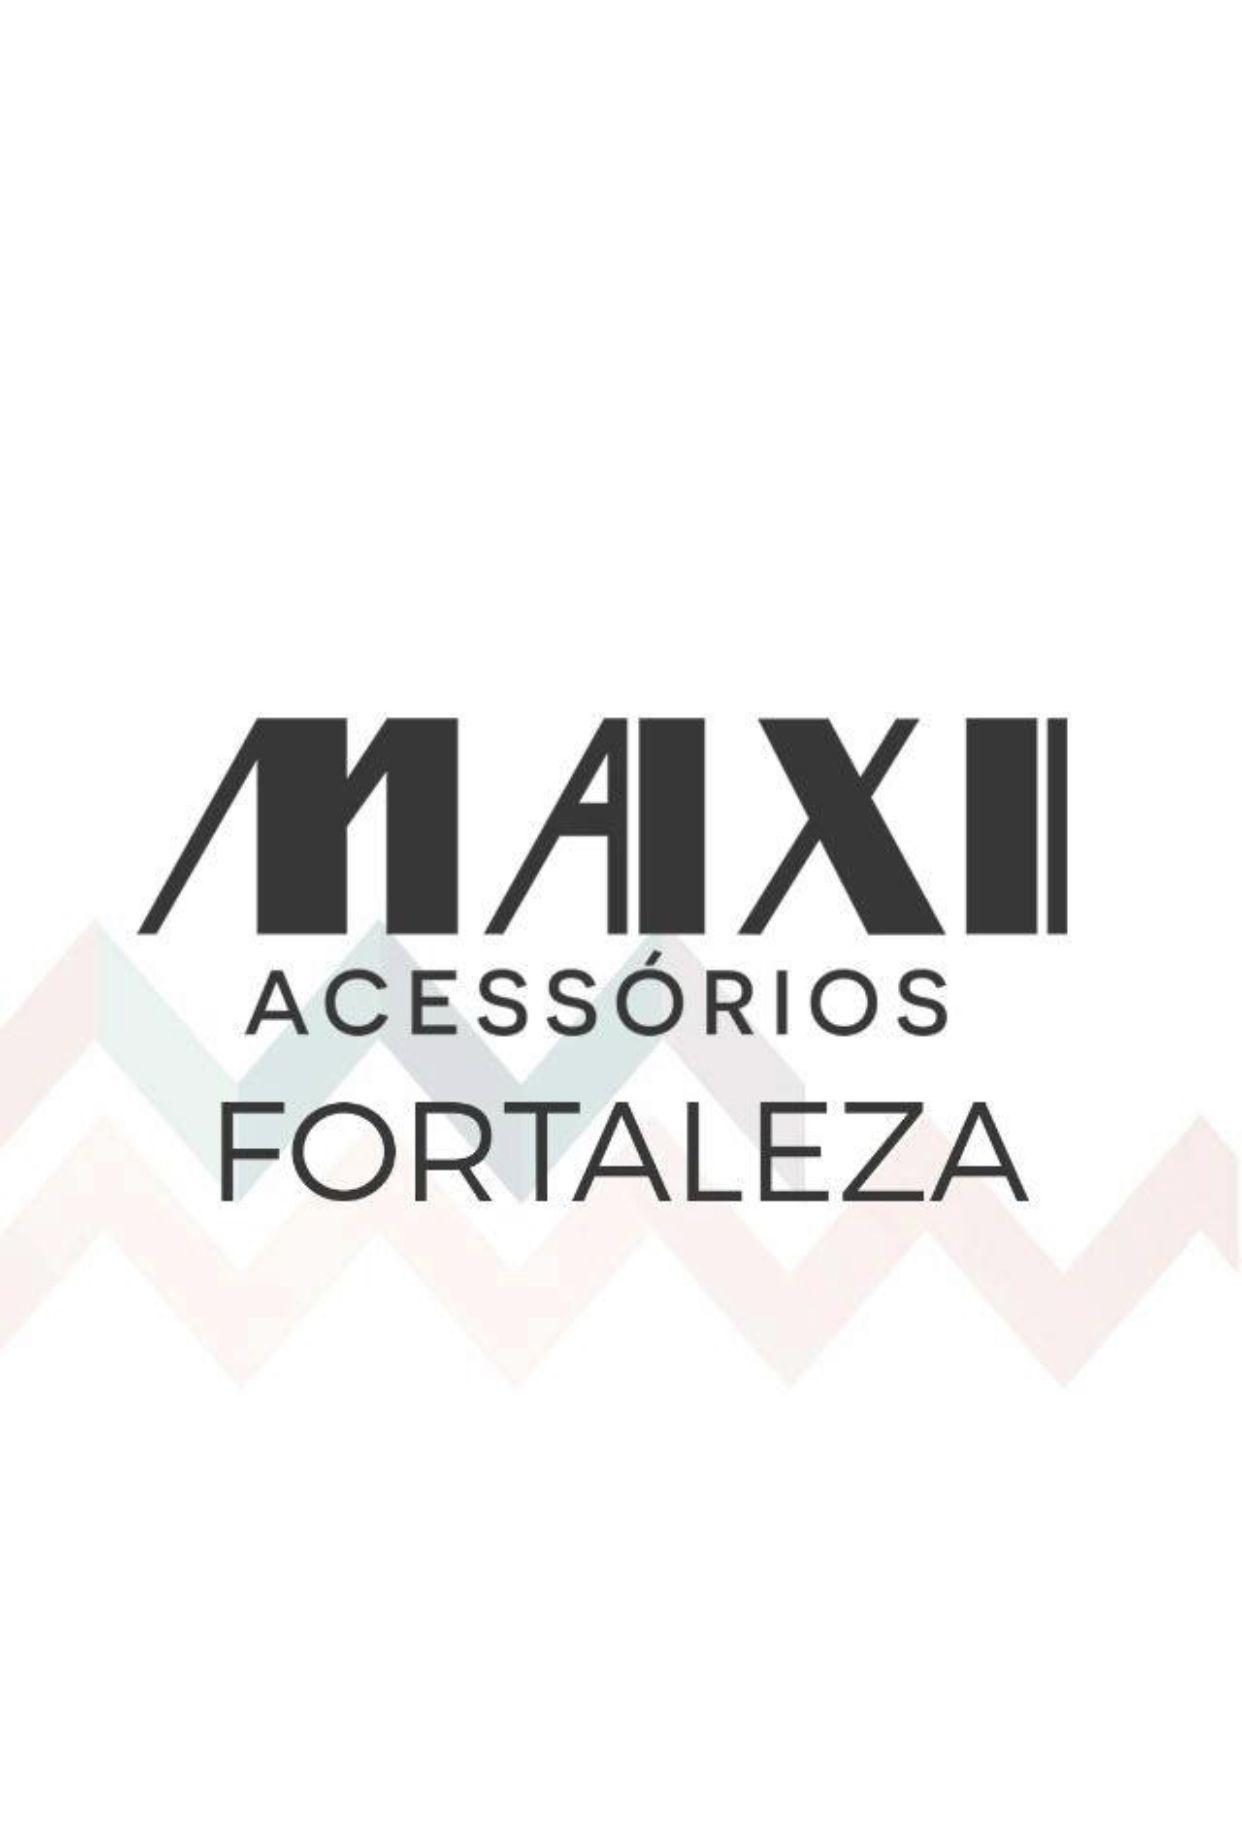 Maxi Acessórios